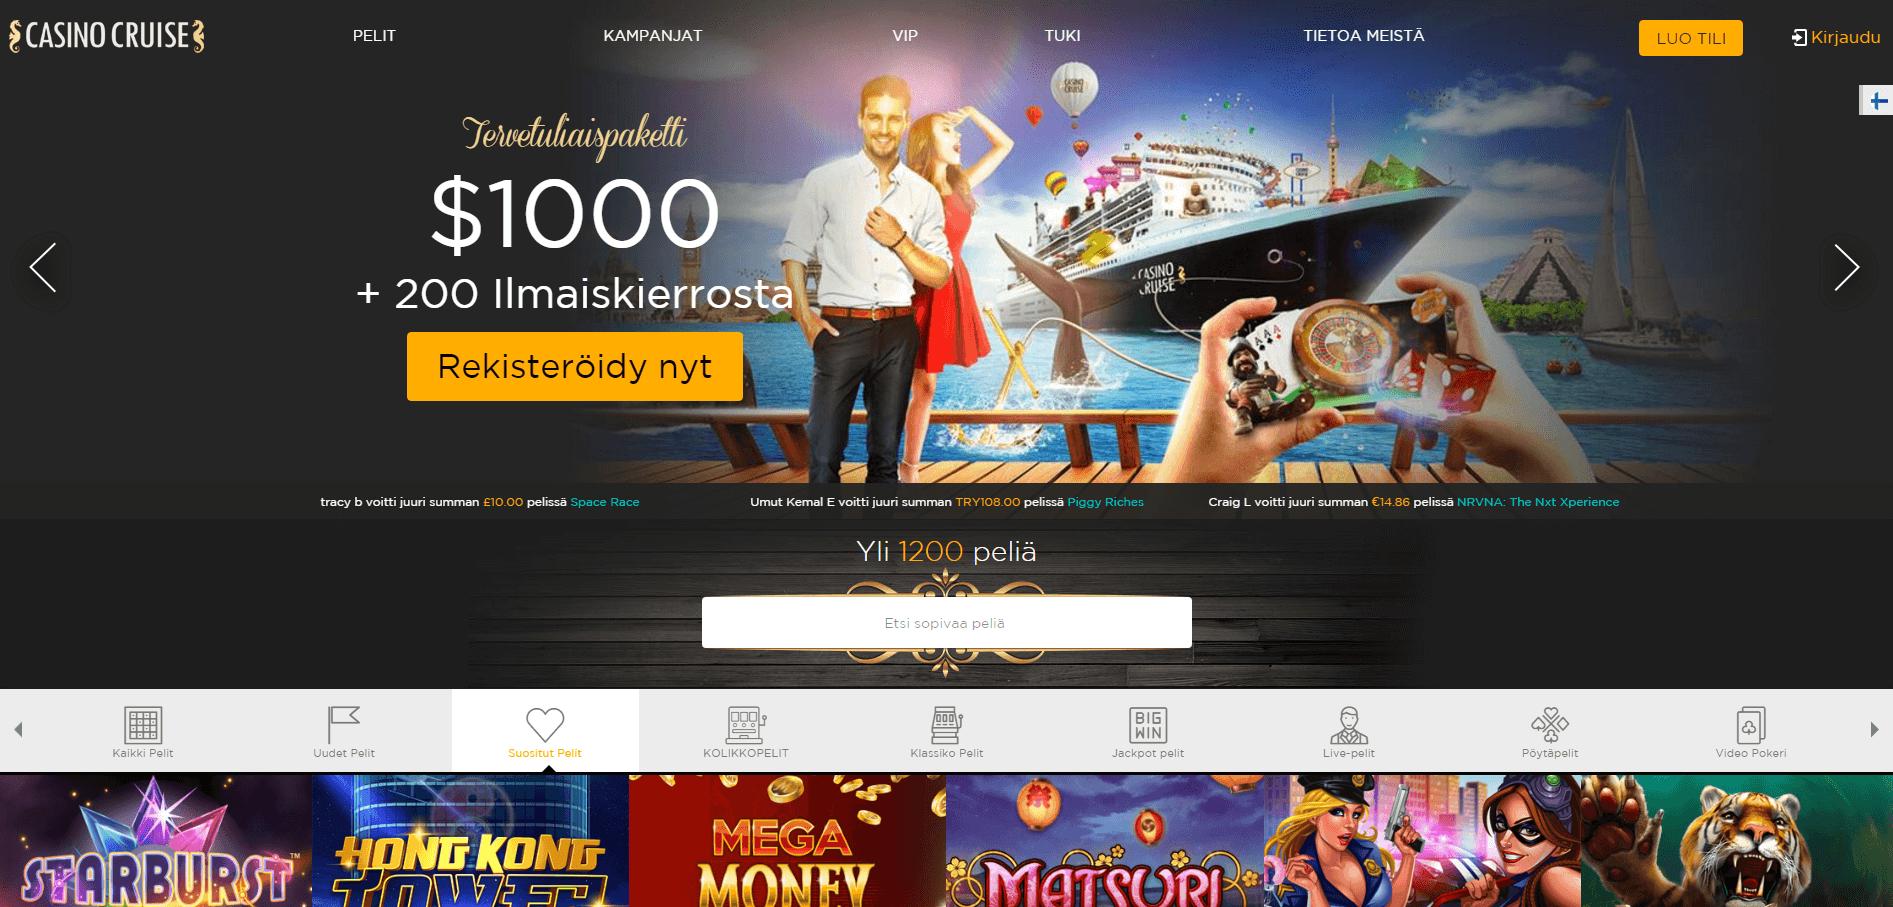 Kampanja Casino Cruise